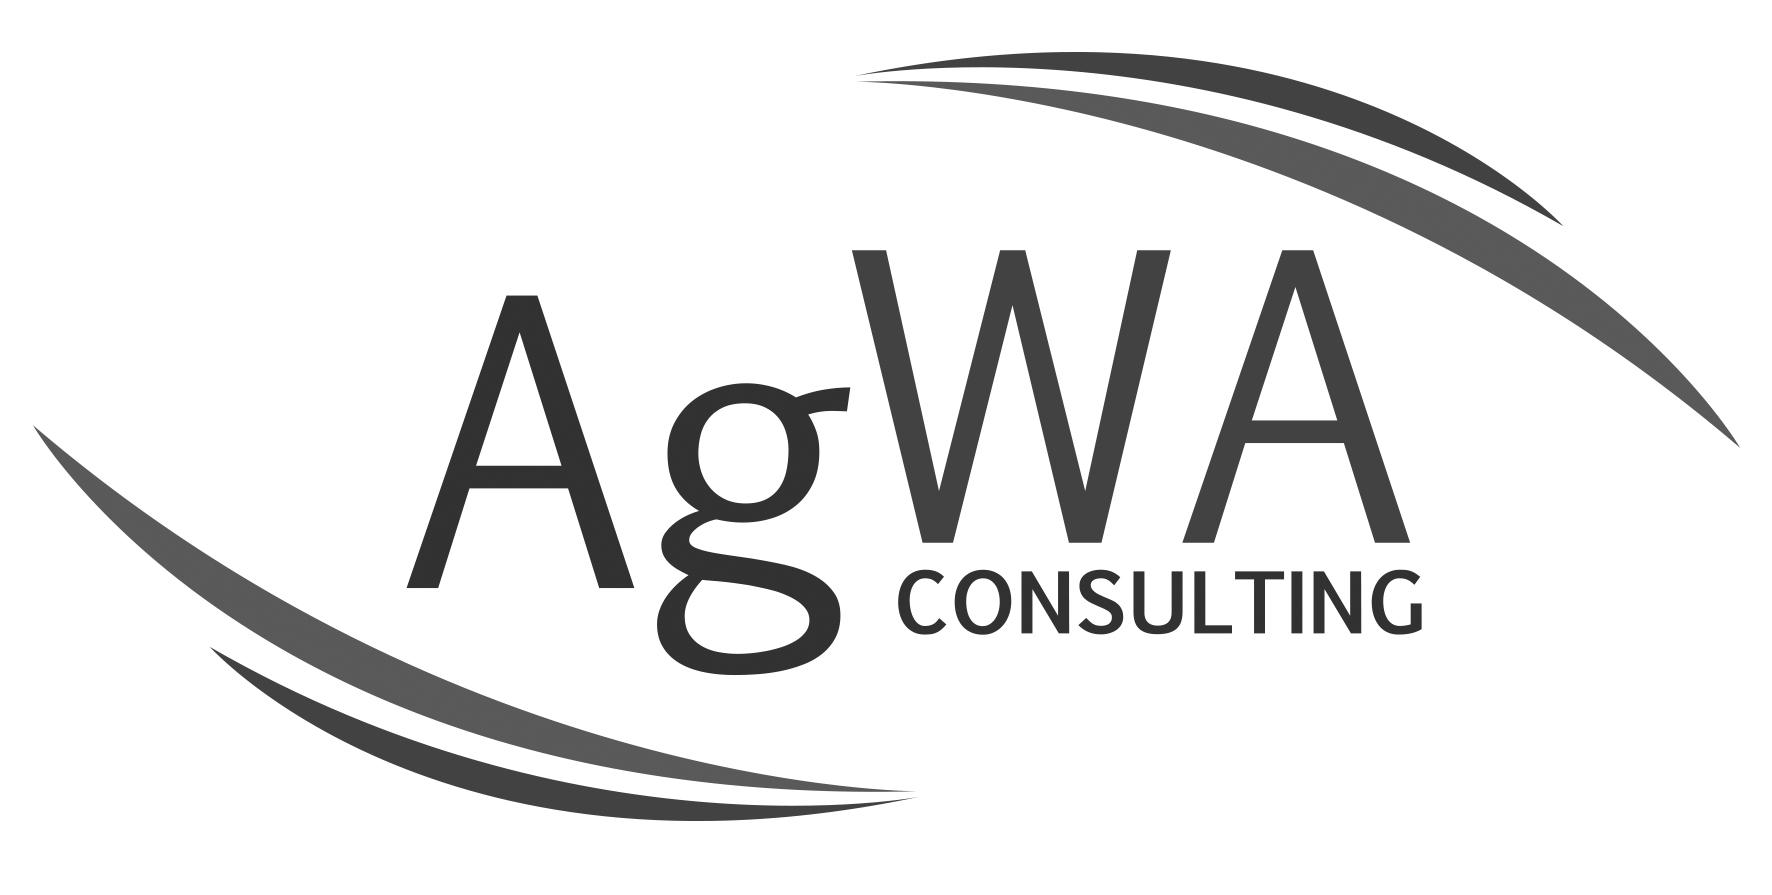 AgWA 300 dpi GREY.jpg